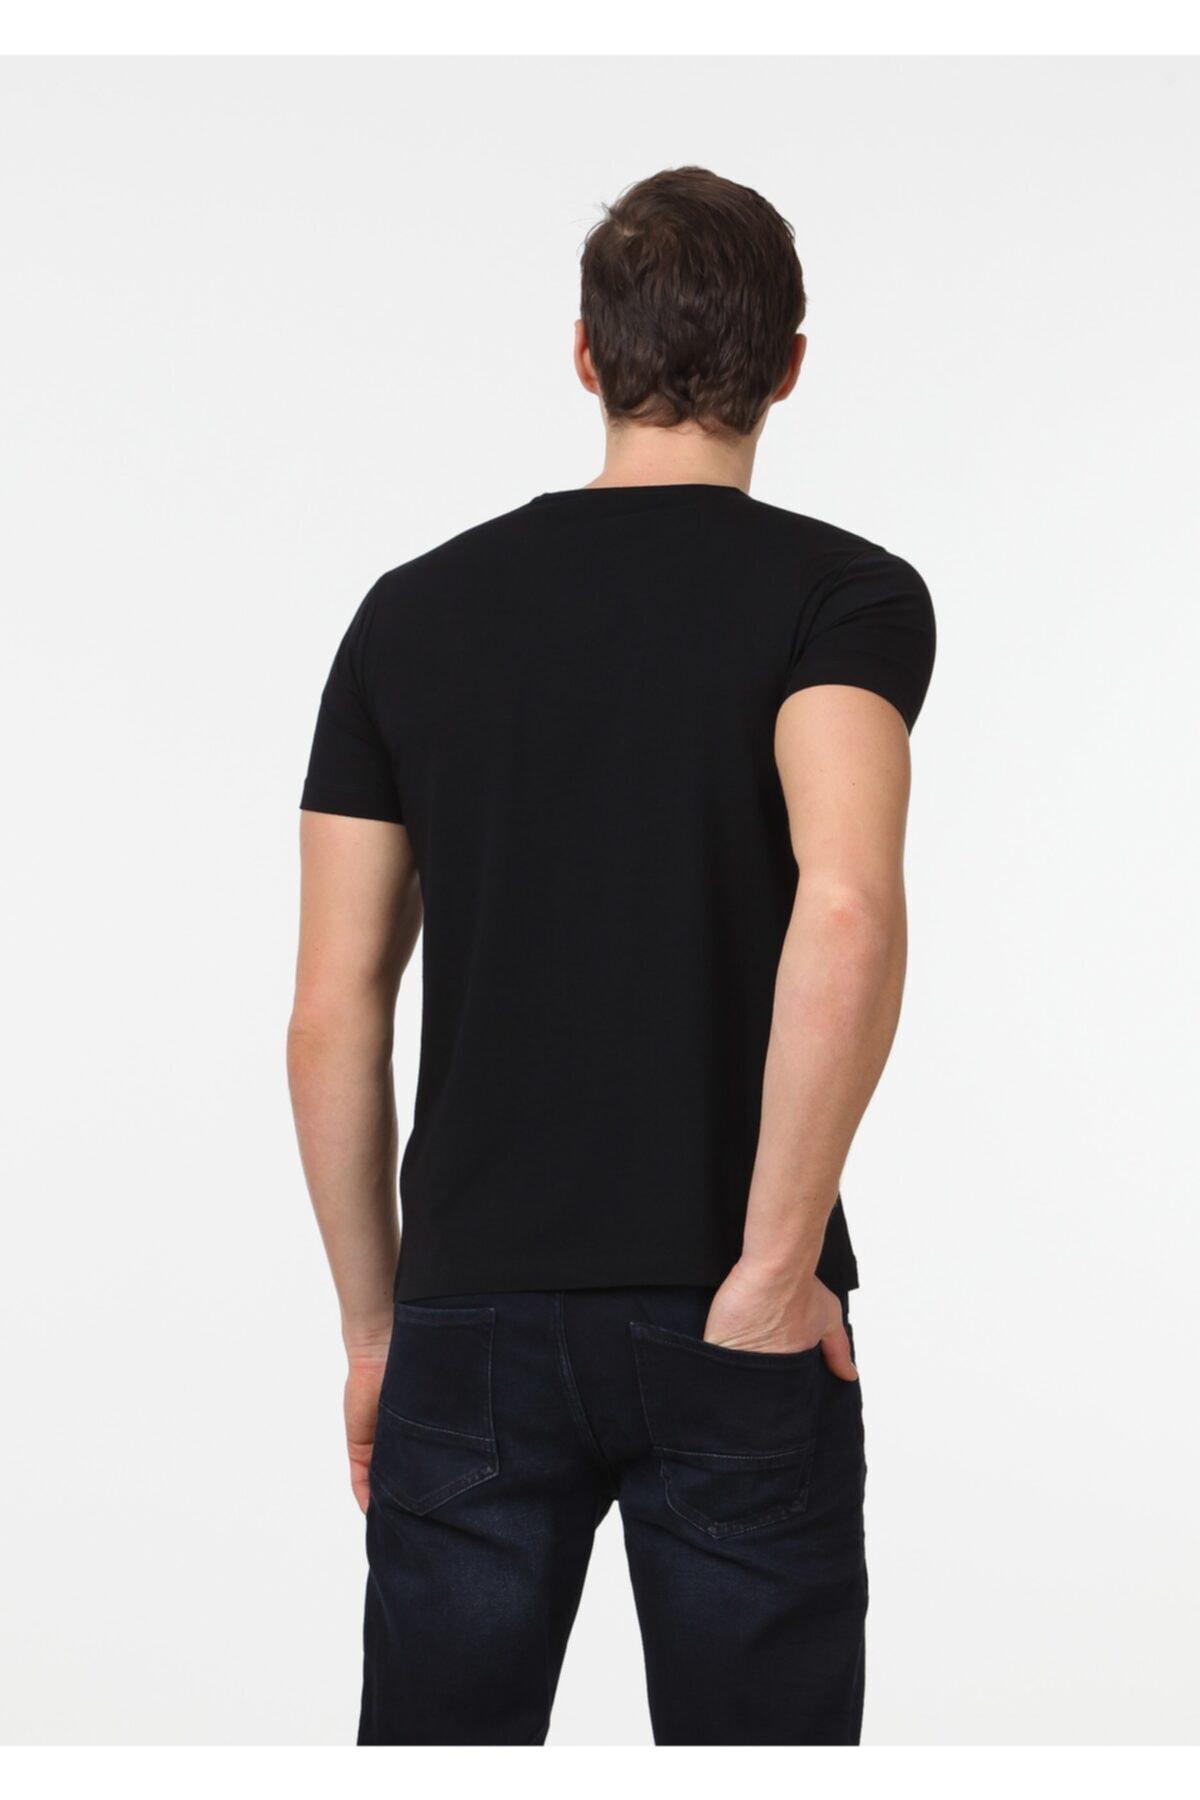 KUPA BUTİK Erkek Siyah Bisiklet Yaka T-shirt